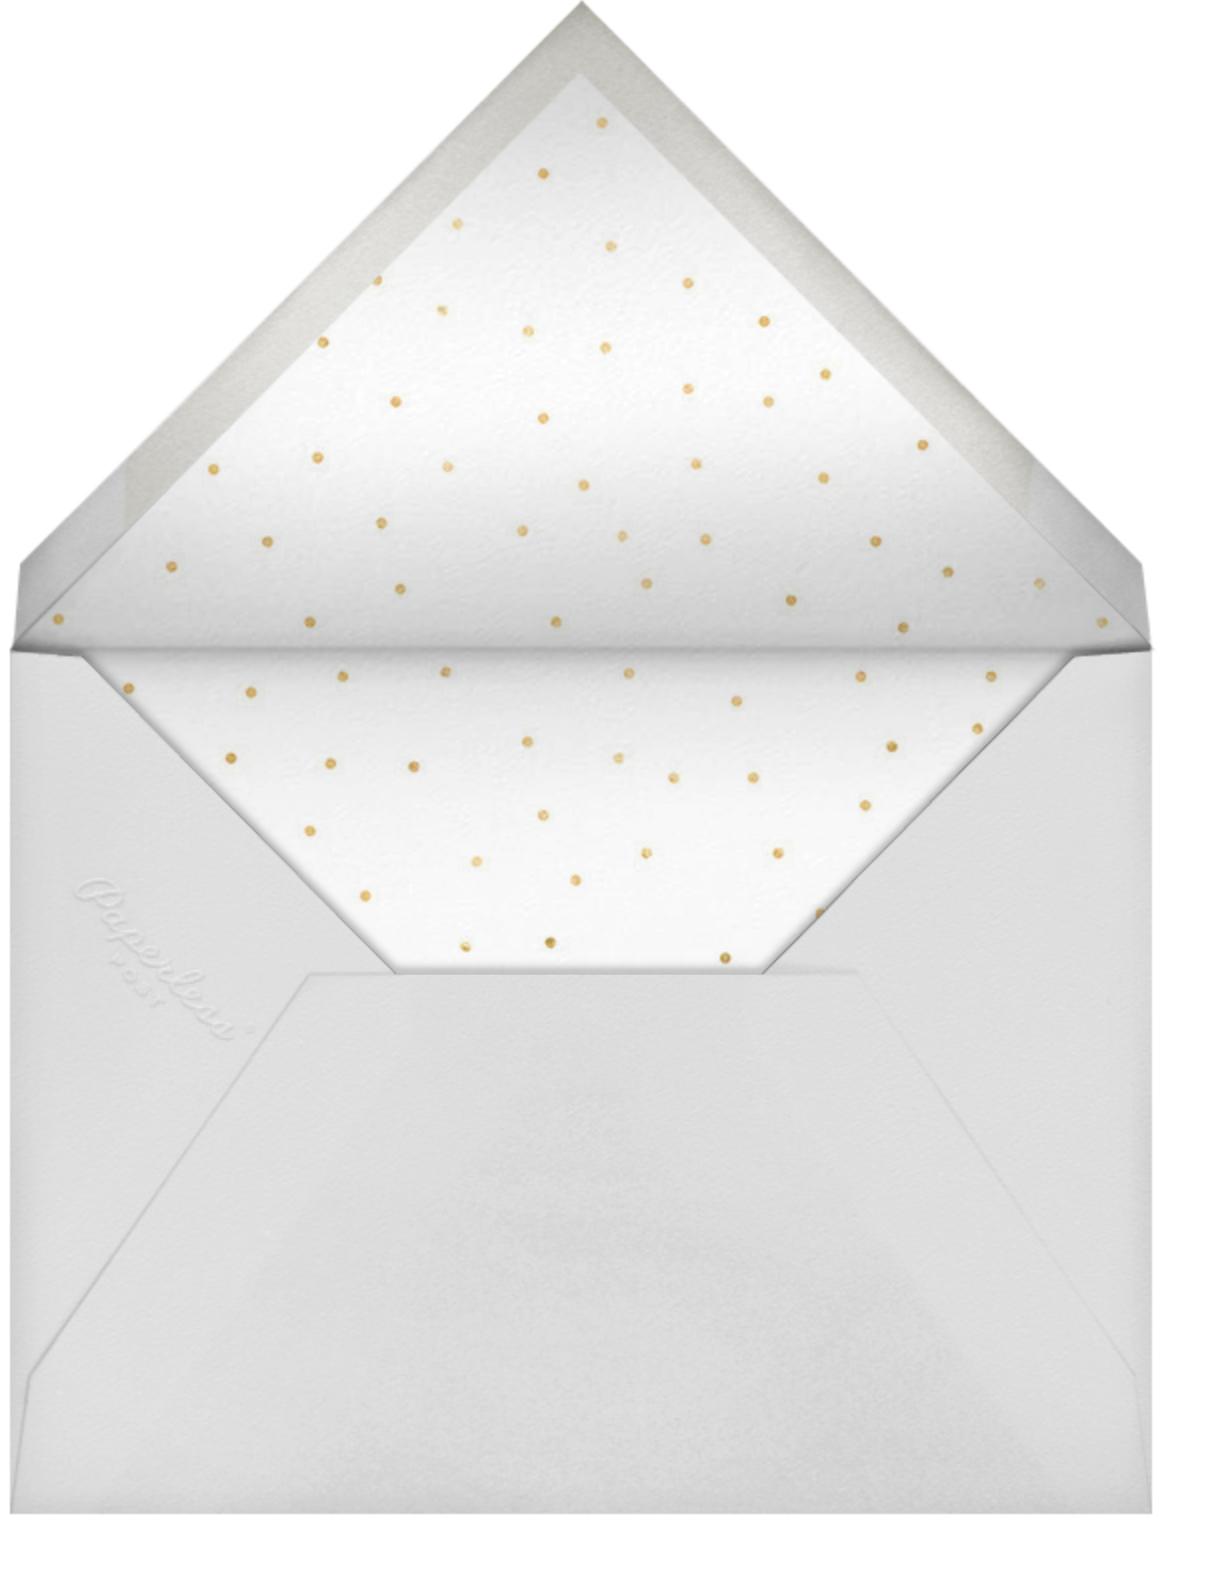 Firework - Satin Gold - Paperless Post - Diwali - envelope back